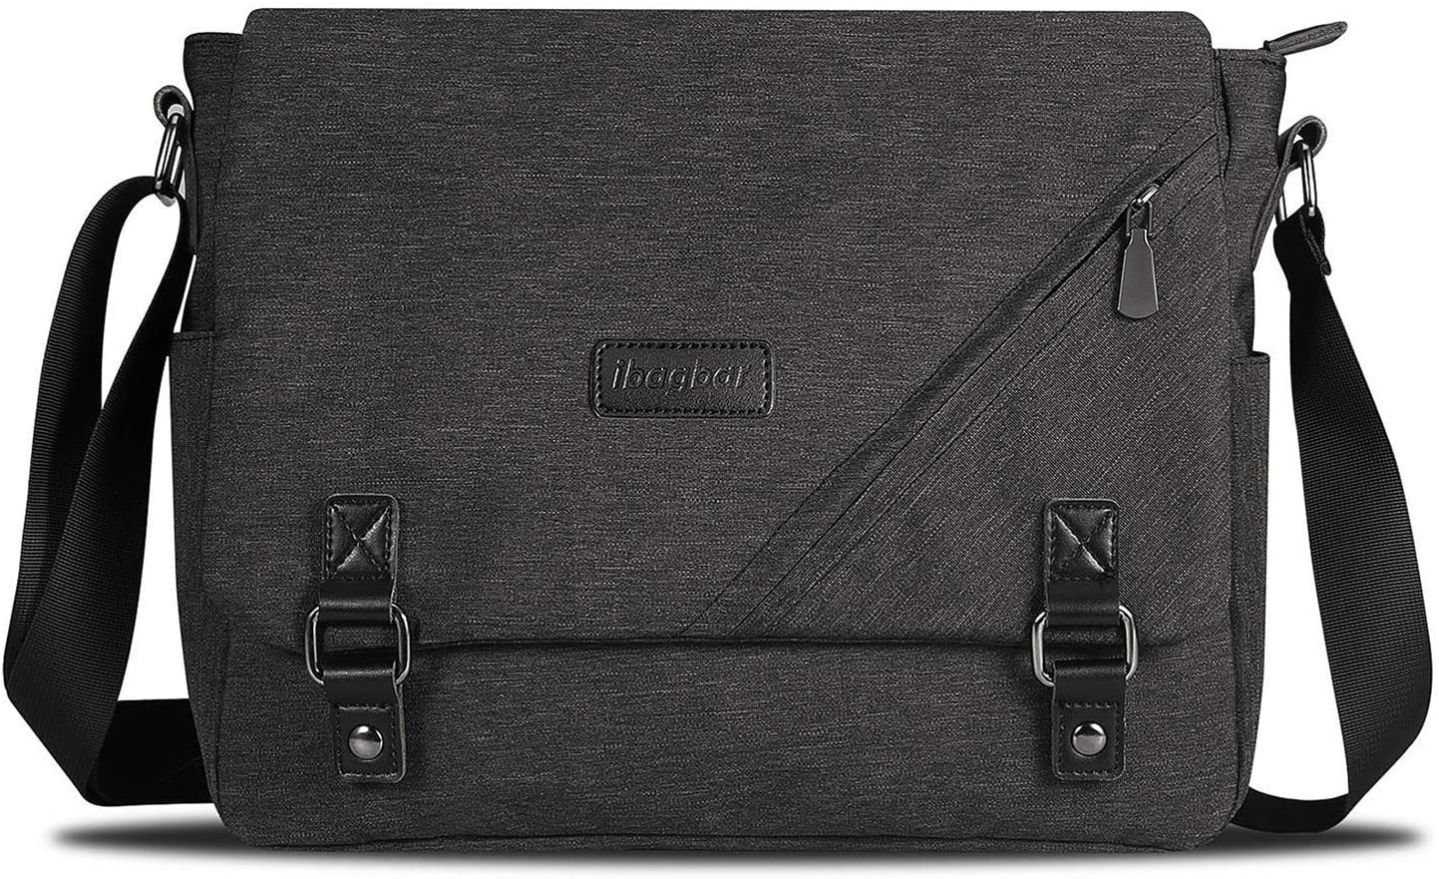 ibagbar Water Resistant Award-winning store Messenger Crossbody Shoulder online shopping Bag Satchel